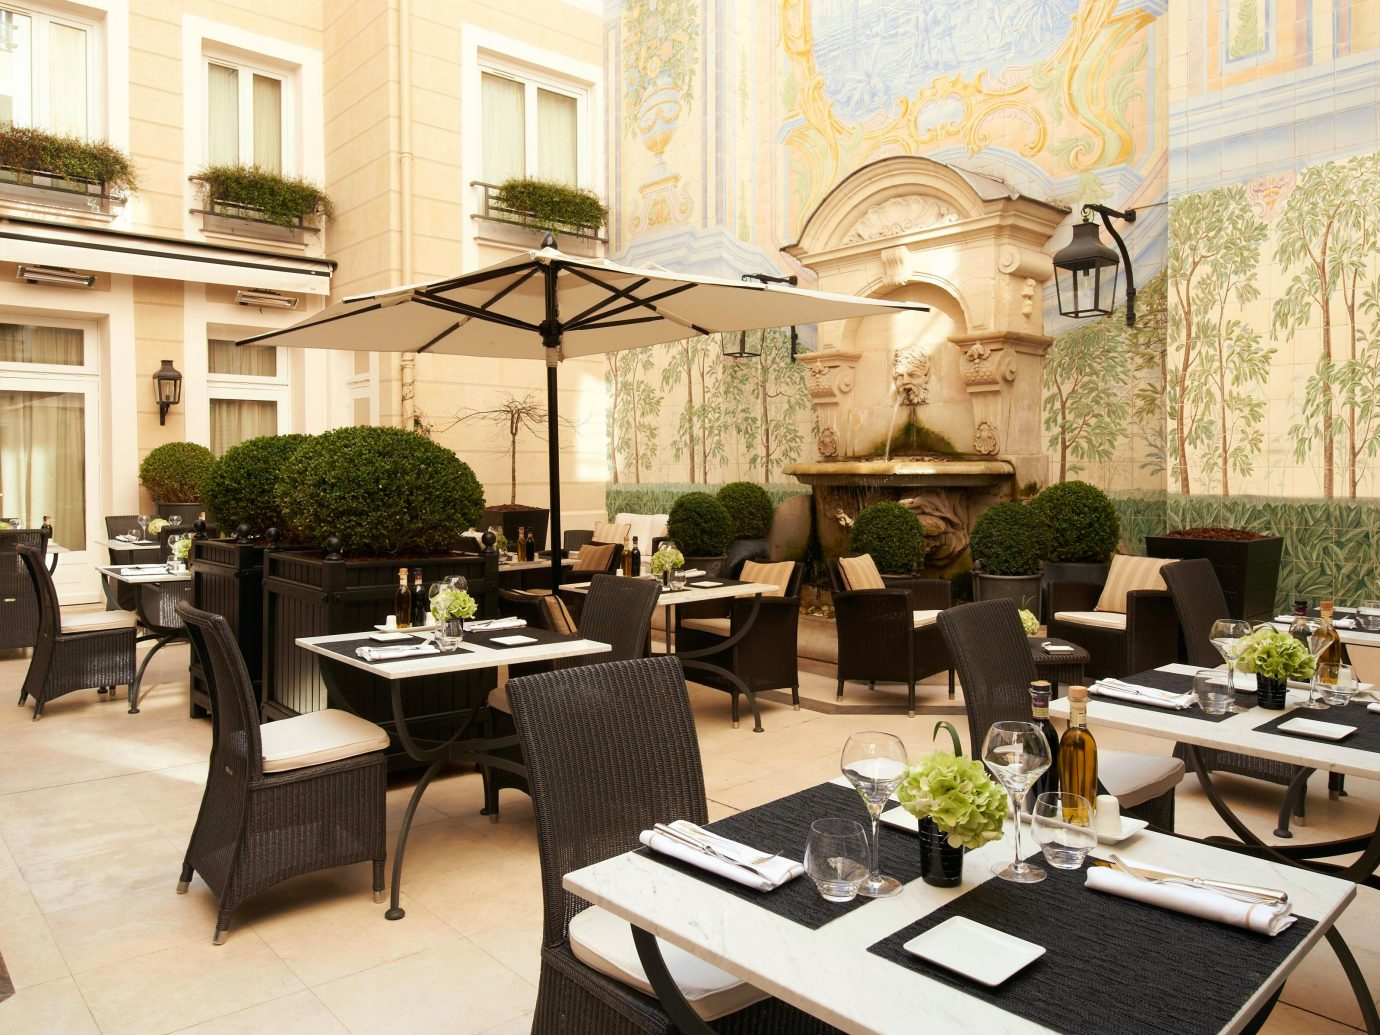 Courtyard of Castille Paris